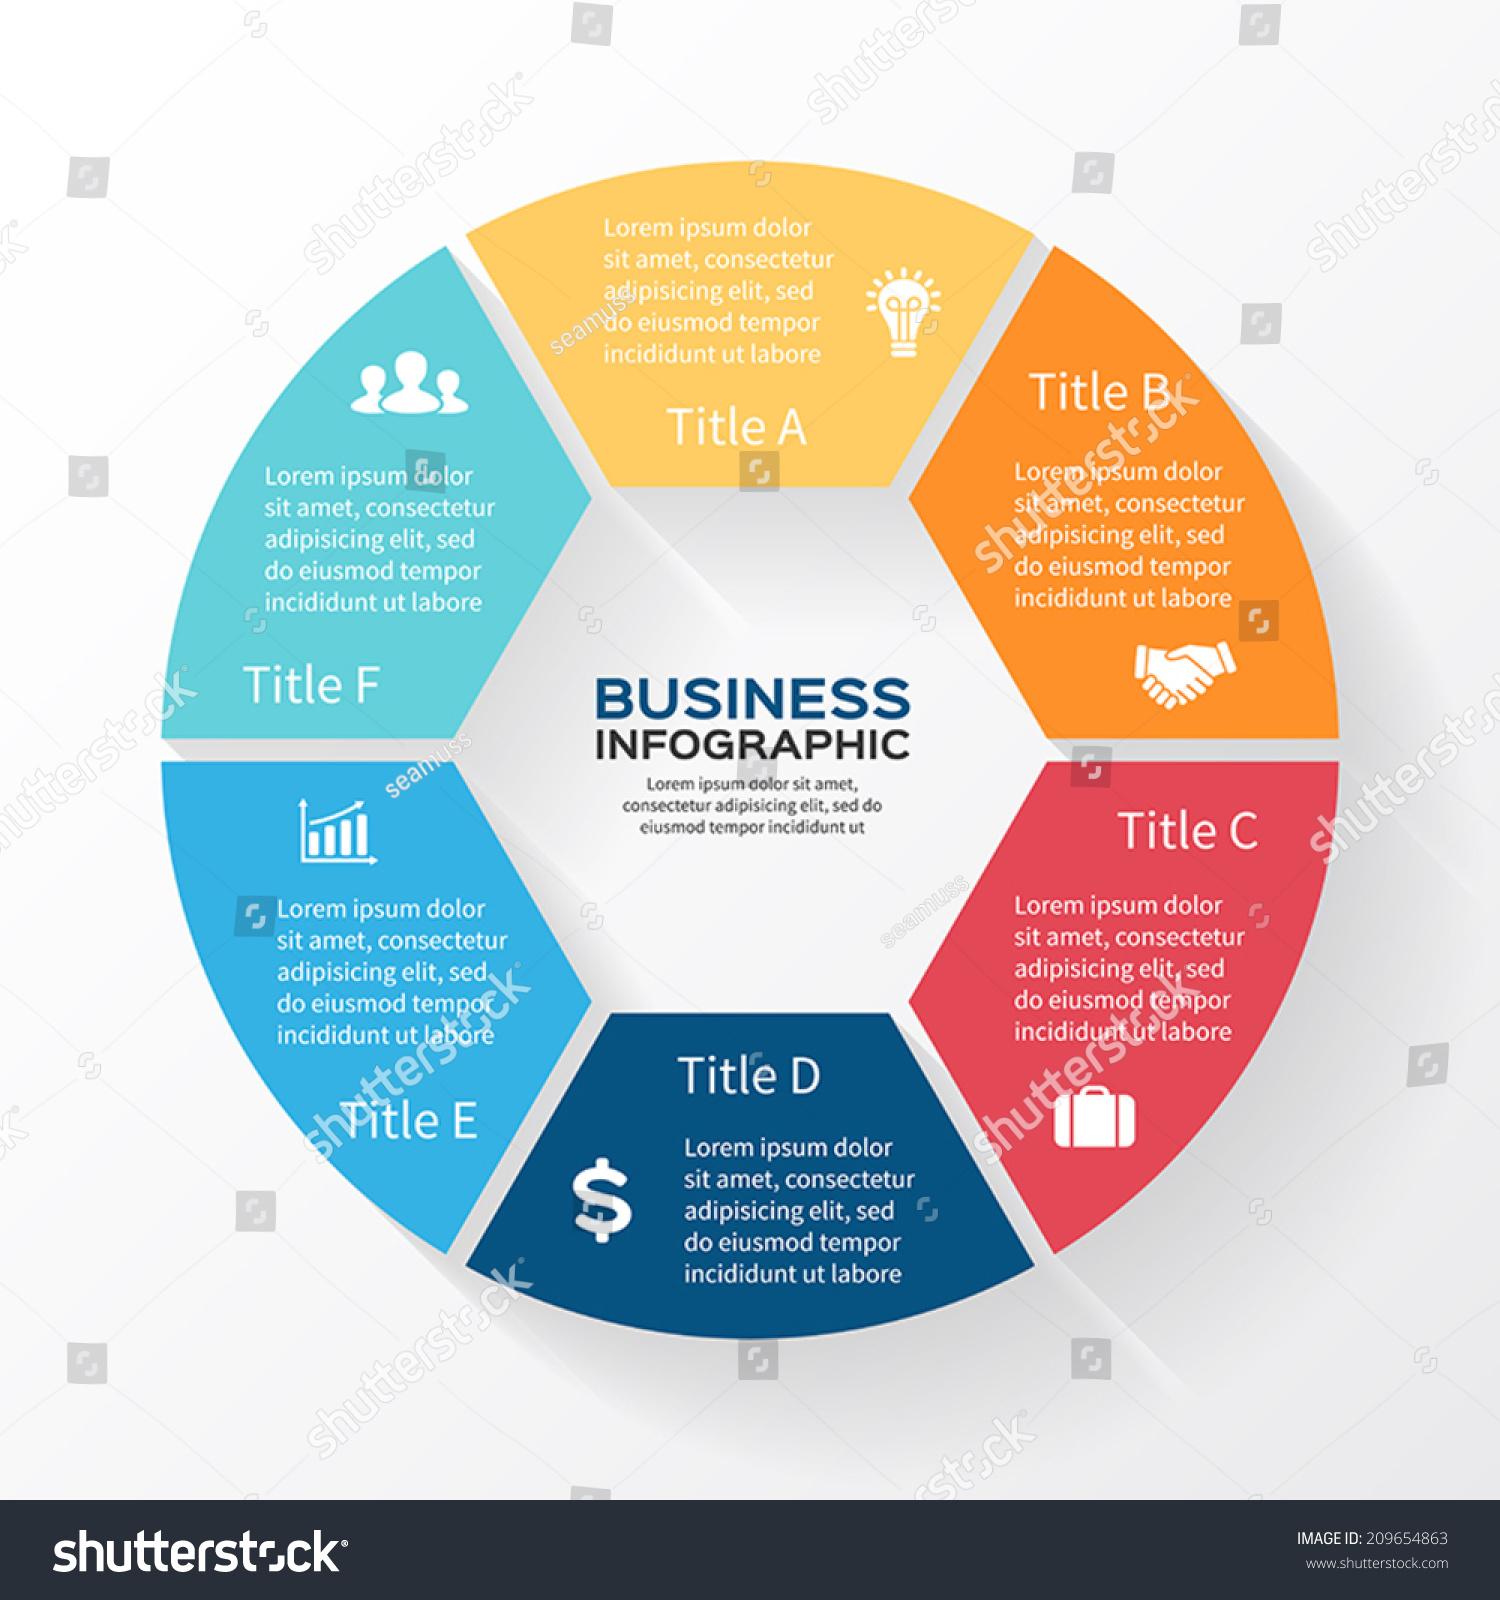 infographic diagram - Etame.mibawa.co